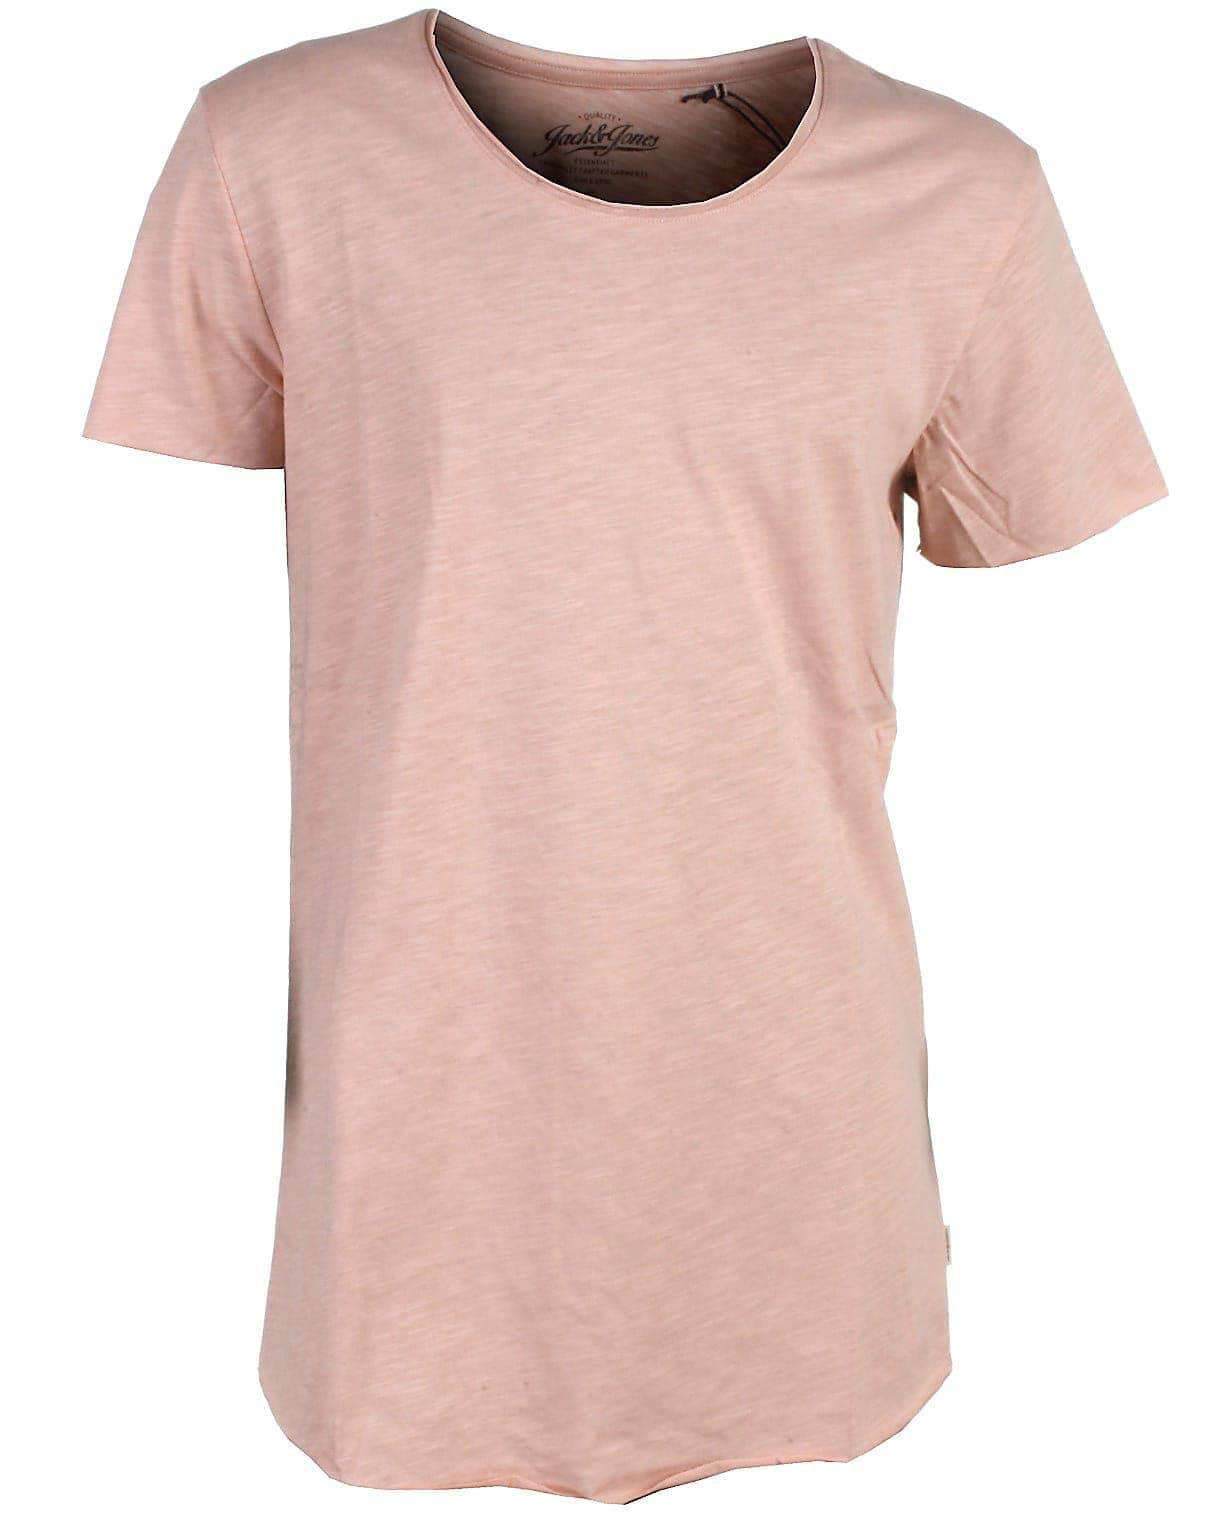 Image of Jack & Jones t-shirt s/s, rosa, Bas